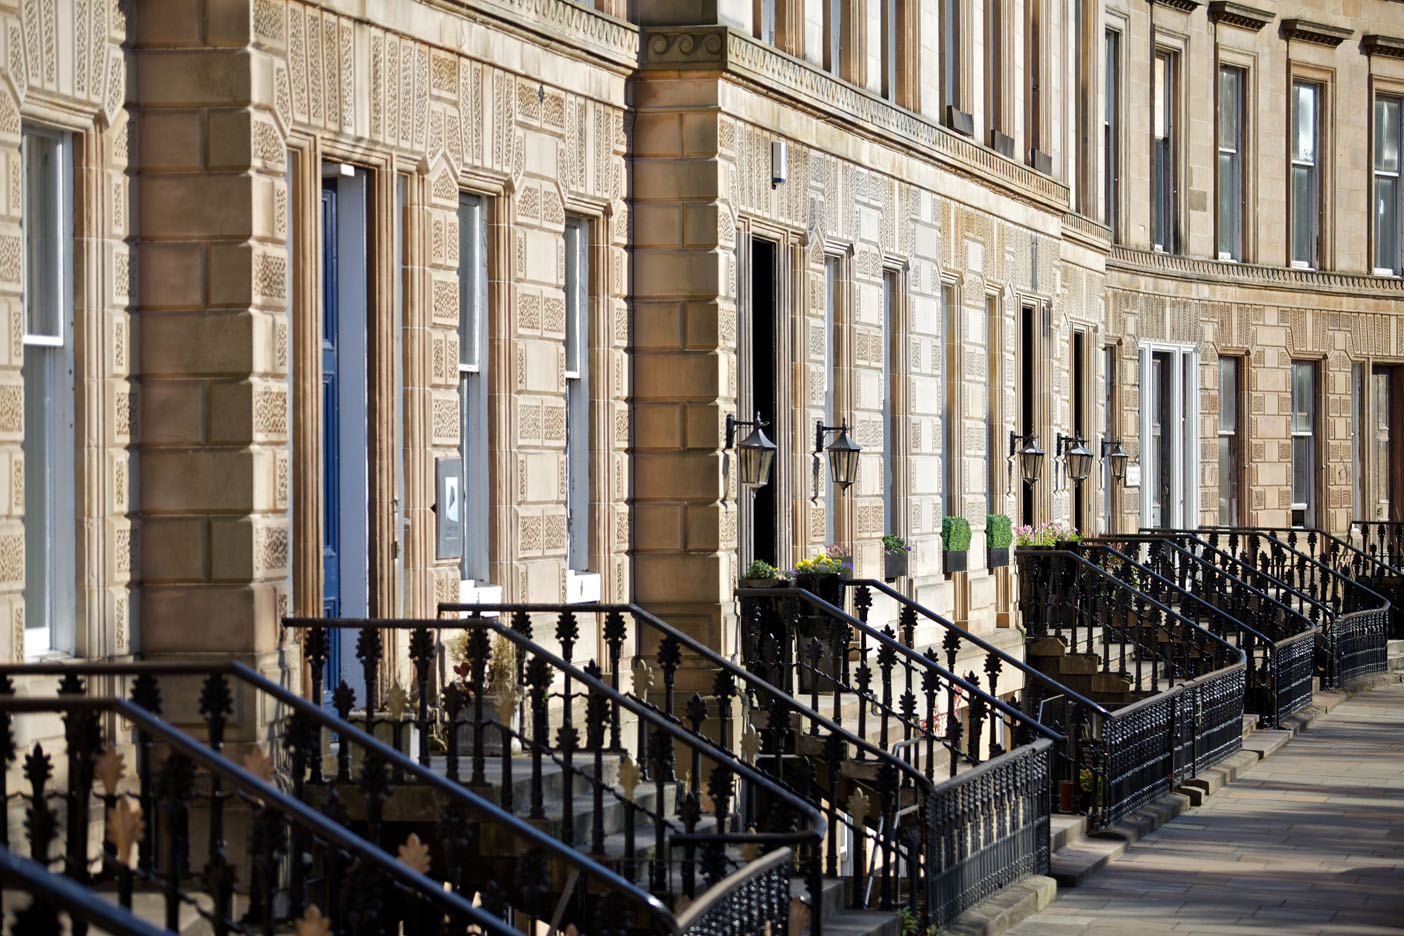 Yellowbrick offices, Lynedoch Present, Glasgow